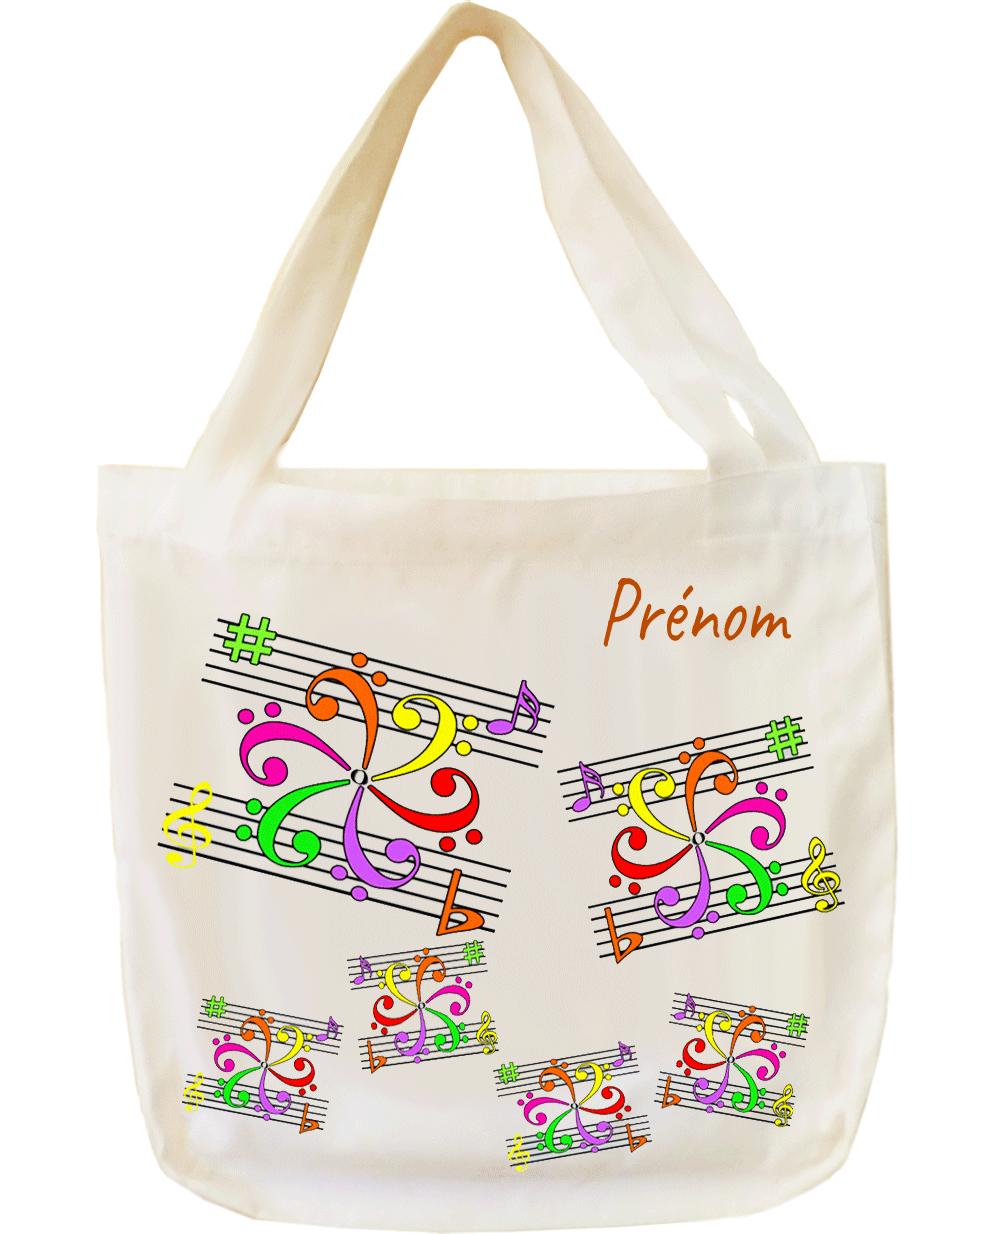 tote-bag;sac;cabas;texti;cadeaux;personnalisable;personnalisation;personnalise;prenom;dessin;zen;mandala